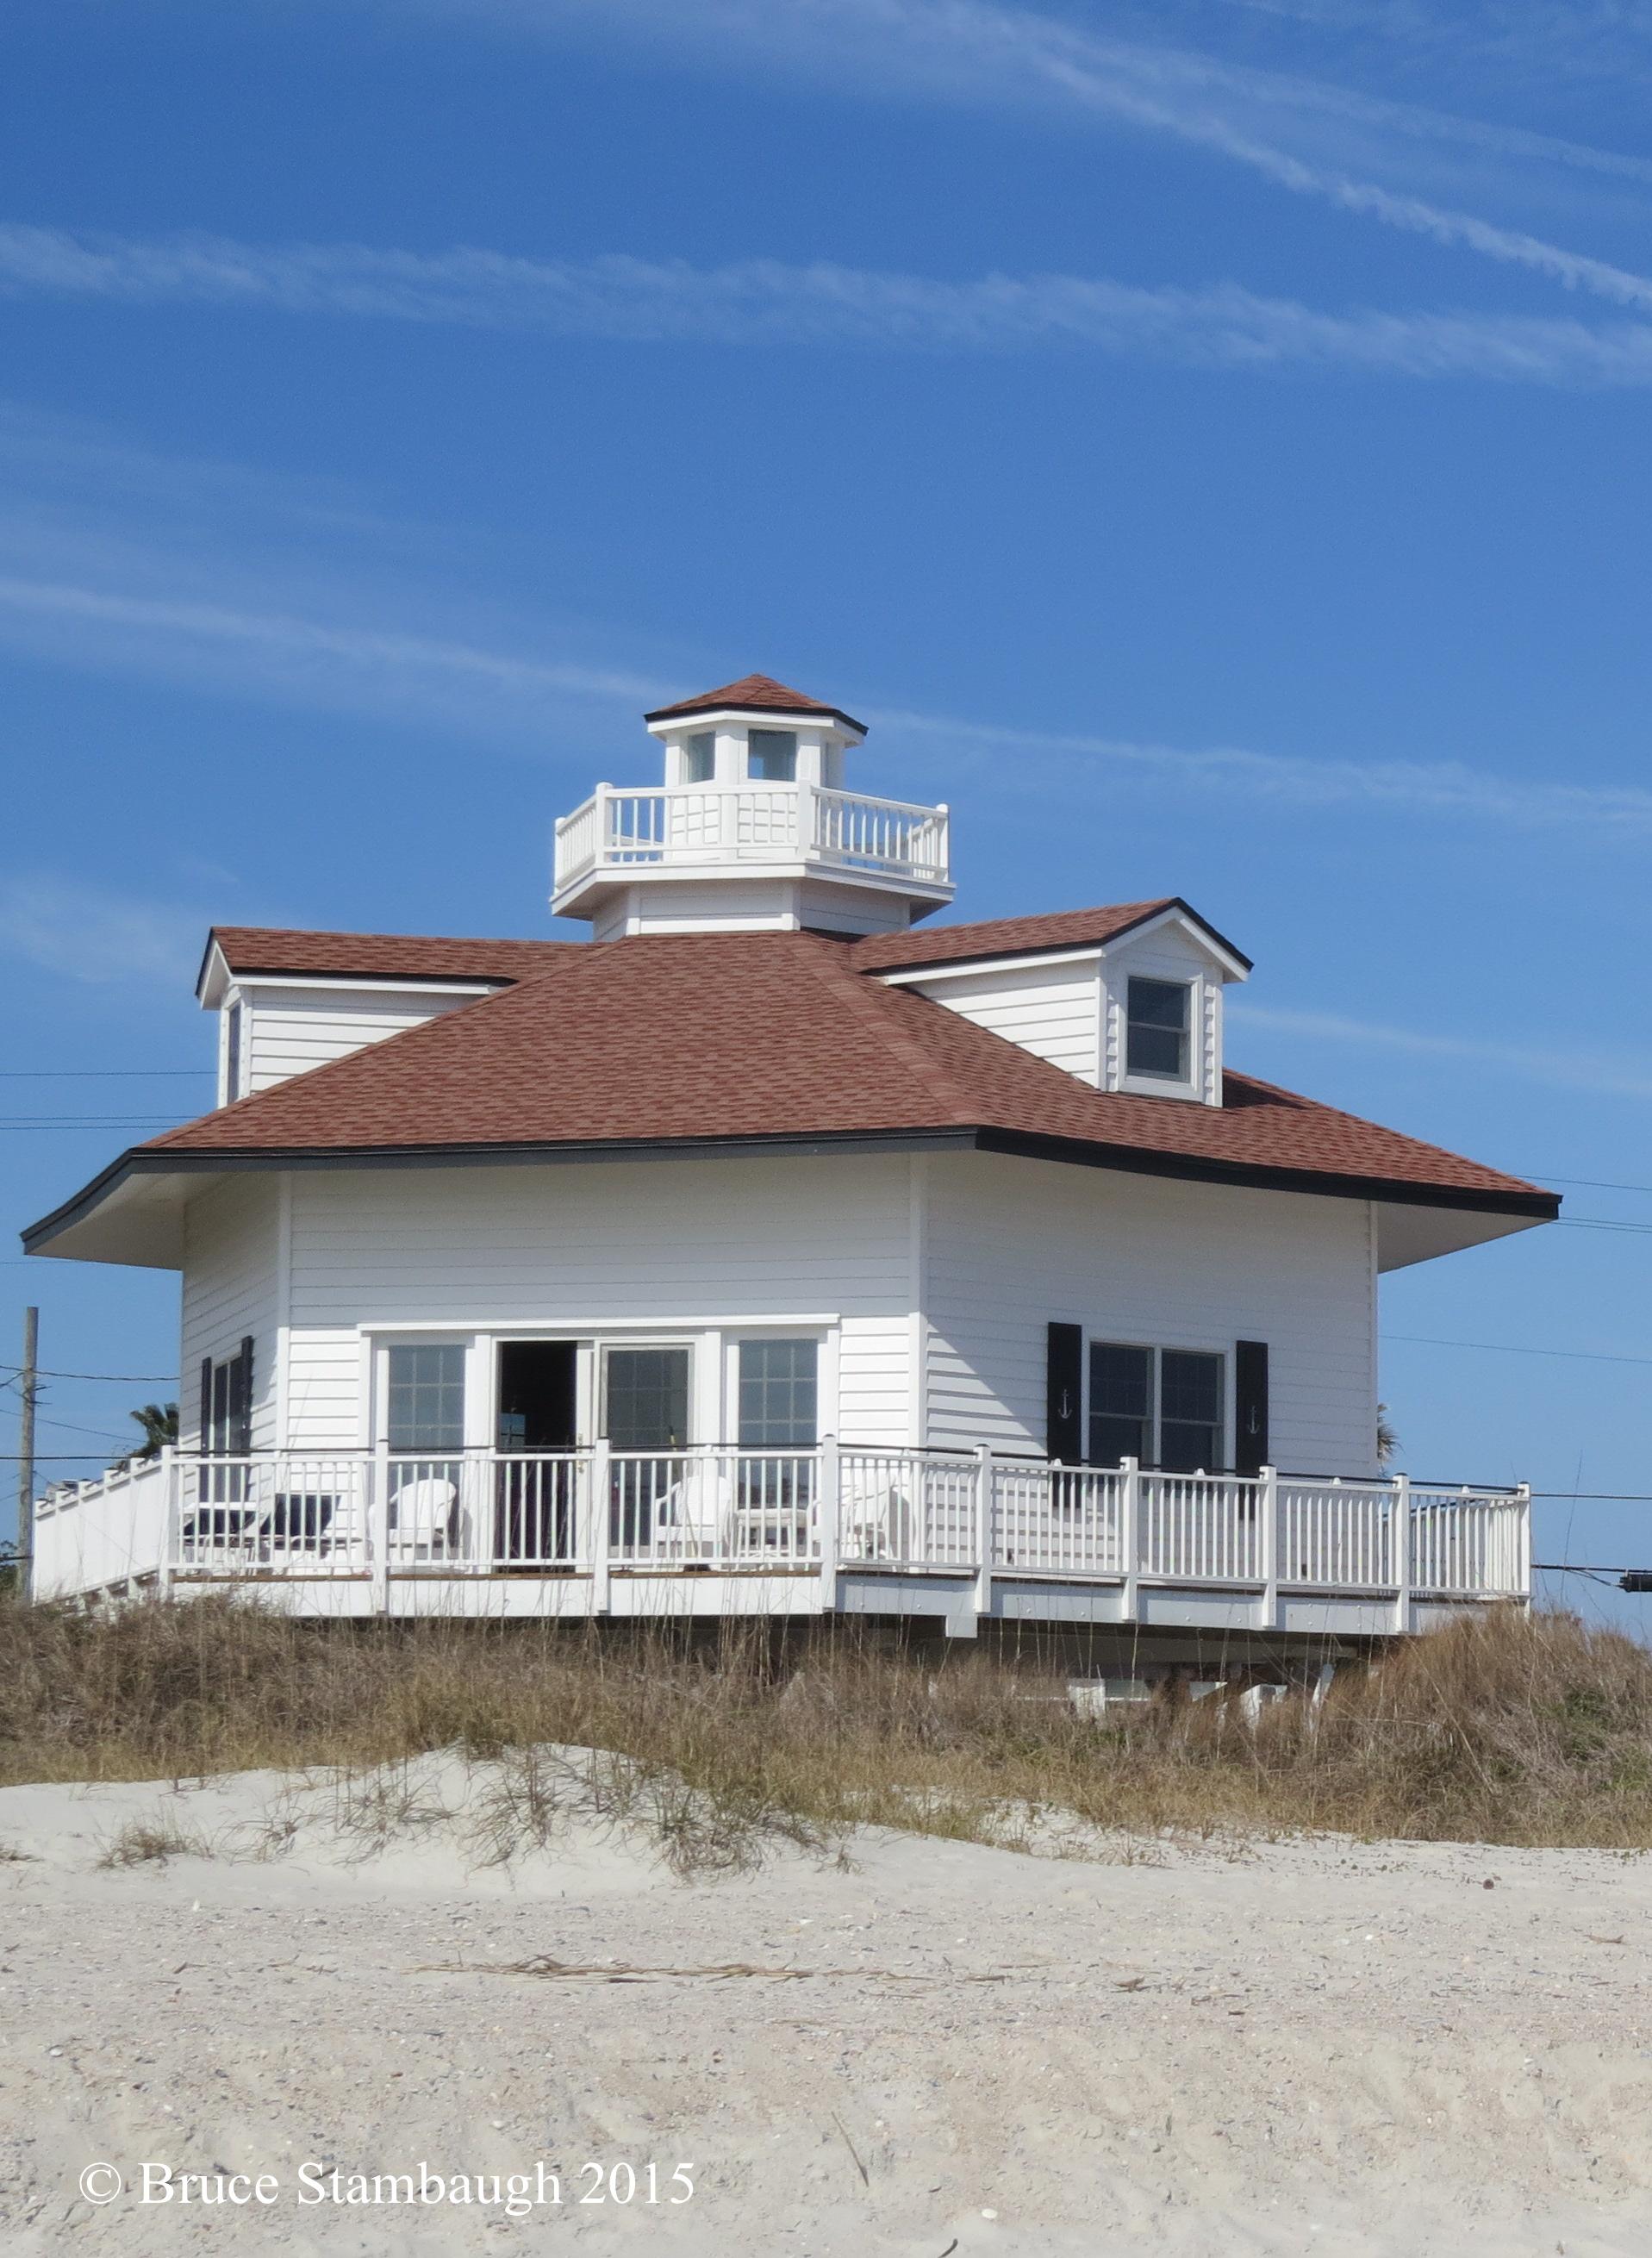 Pippi Longstocking Comes To Life On Amelia Island Florida